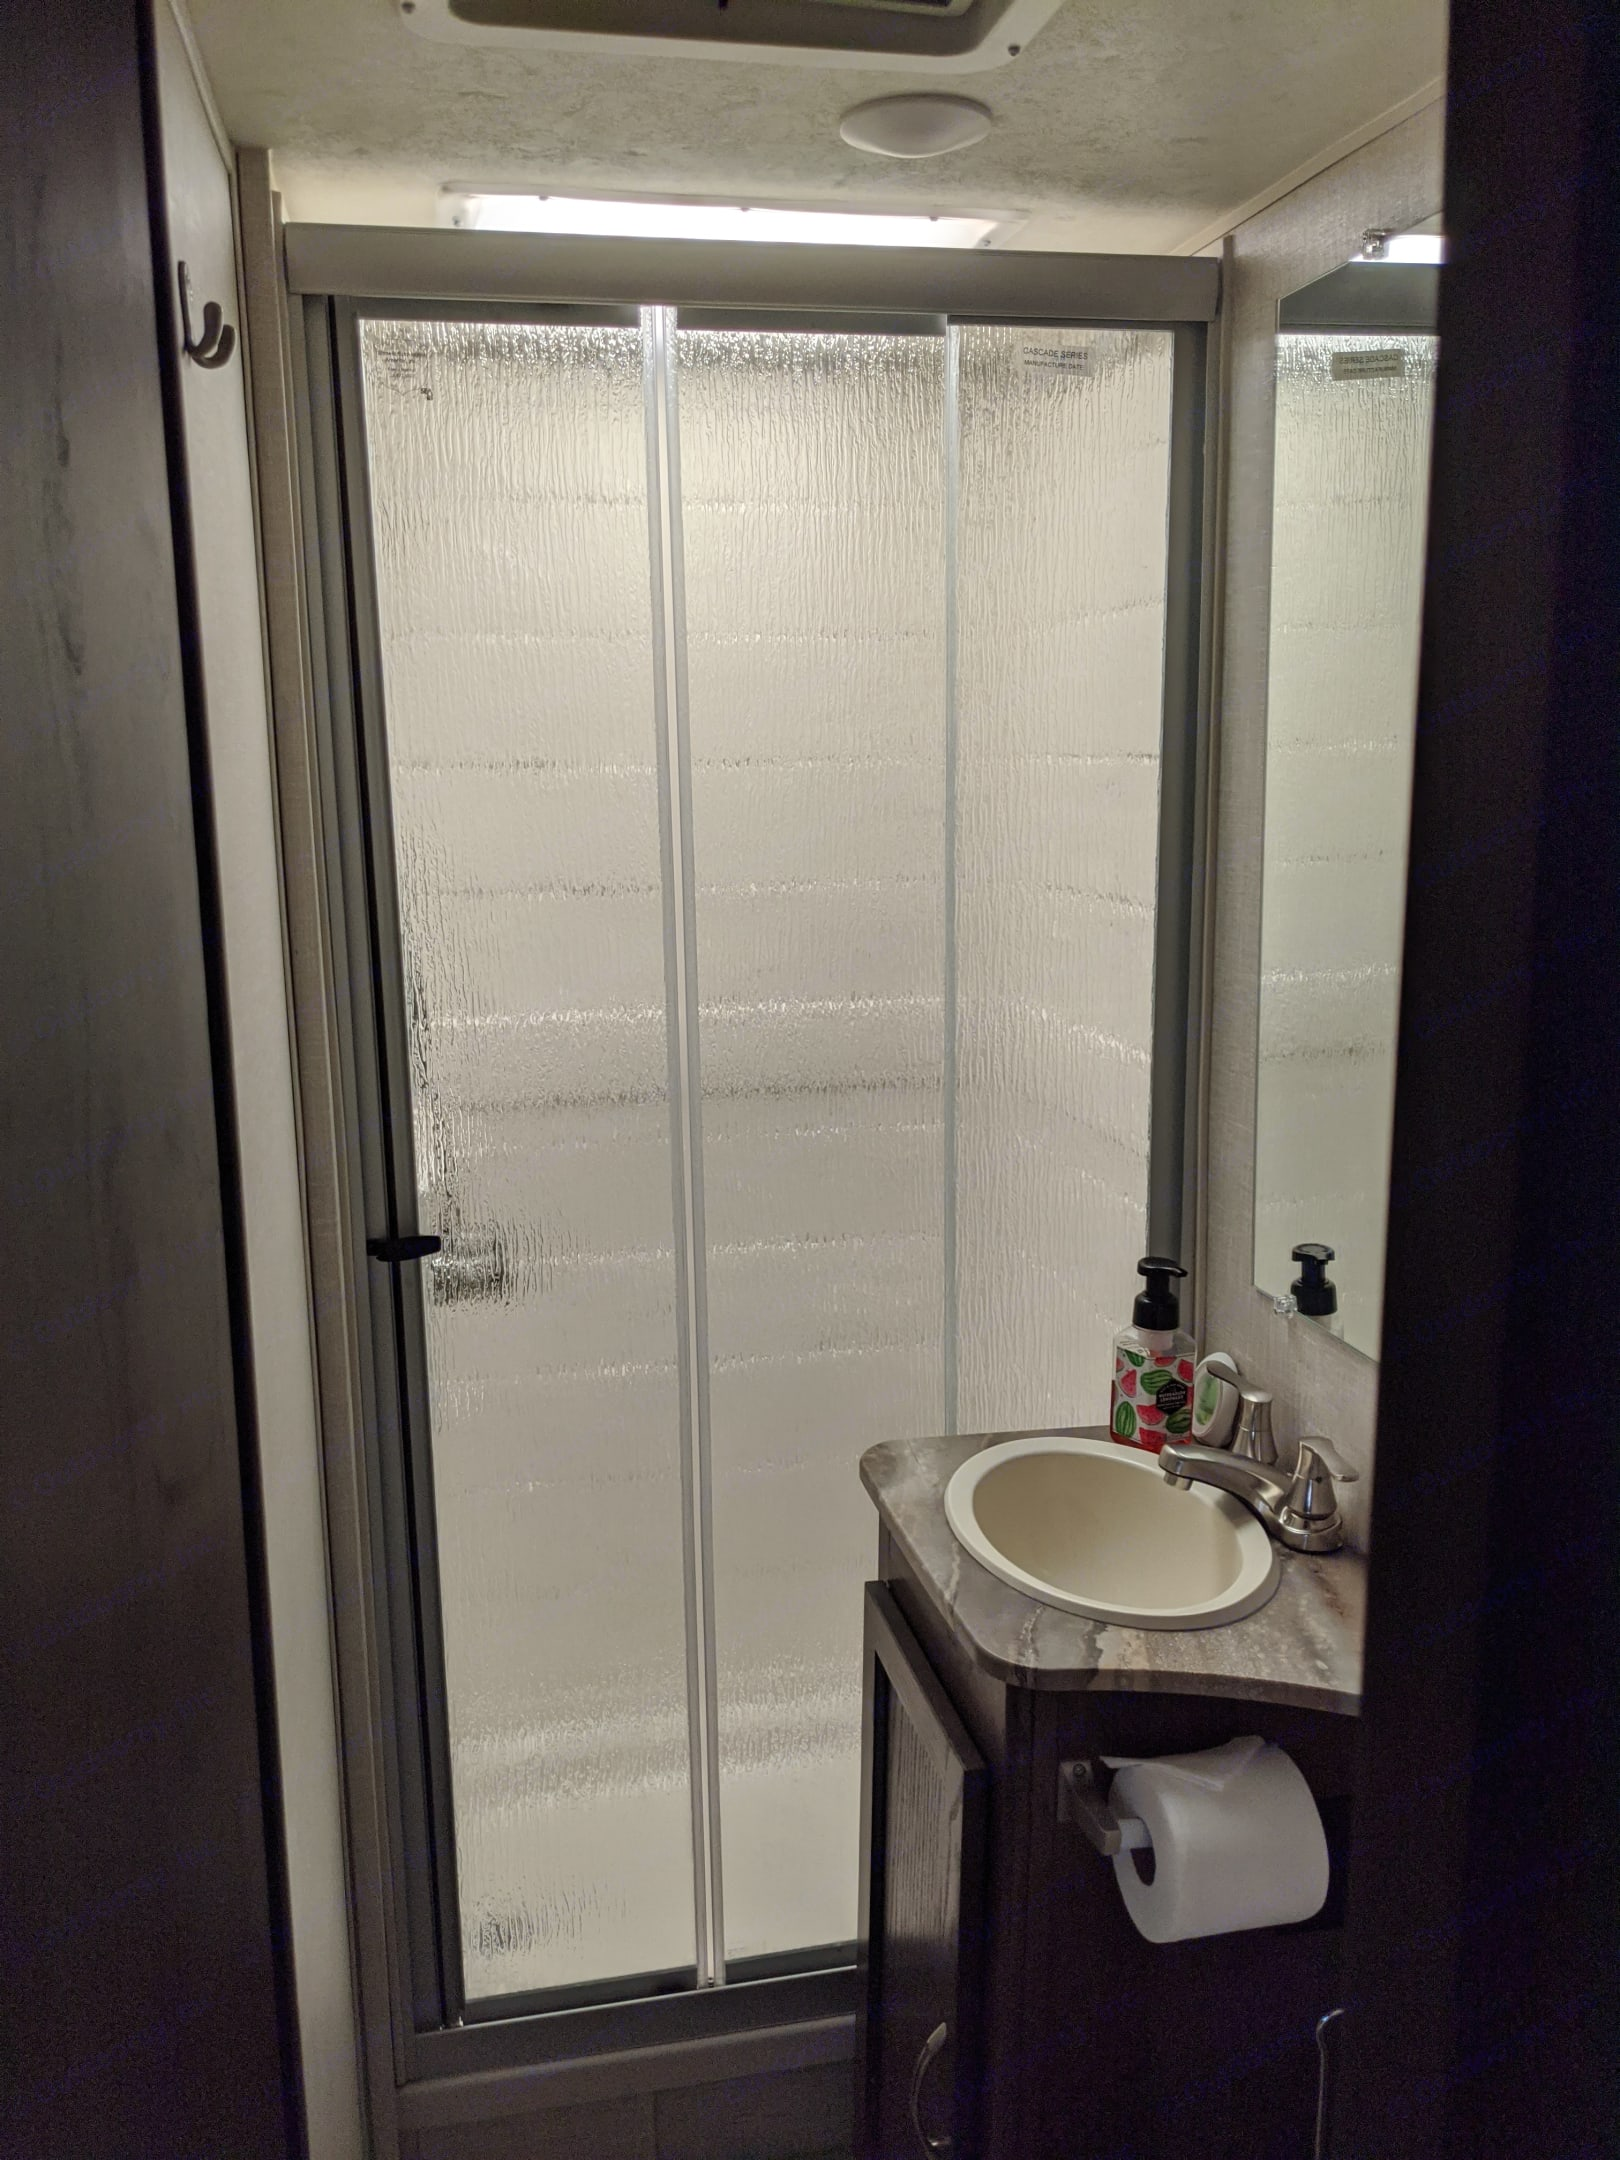 Bathroom with vanity, sink and shower with sliding glass doors. Coachmen Freelander 2020